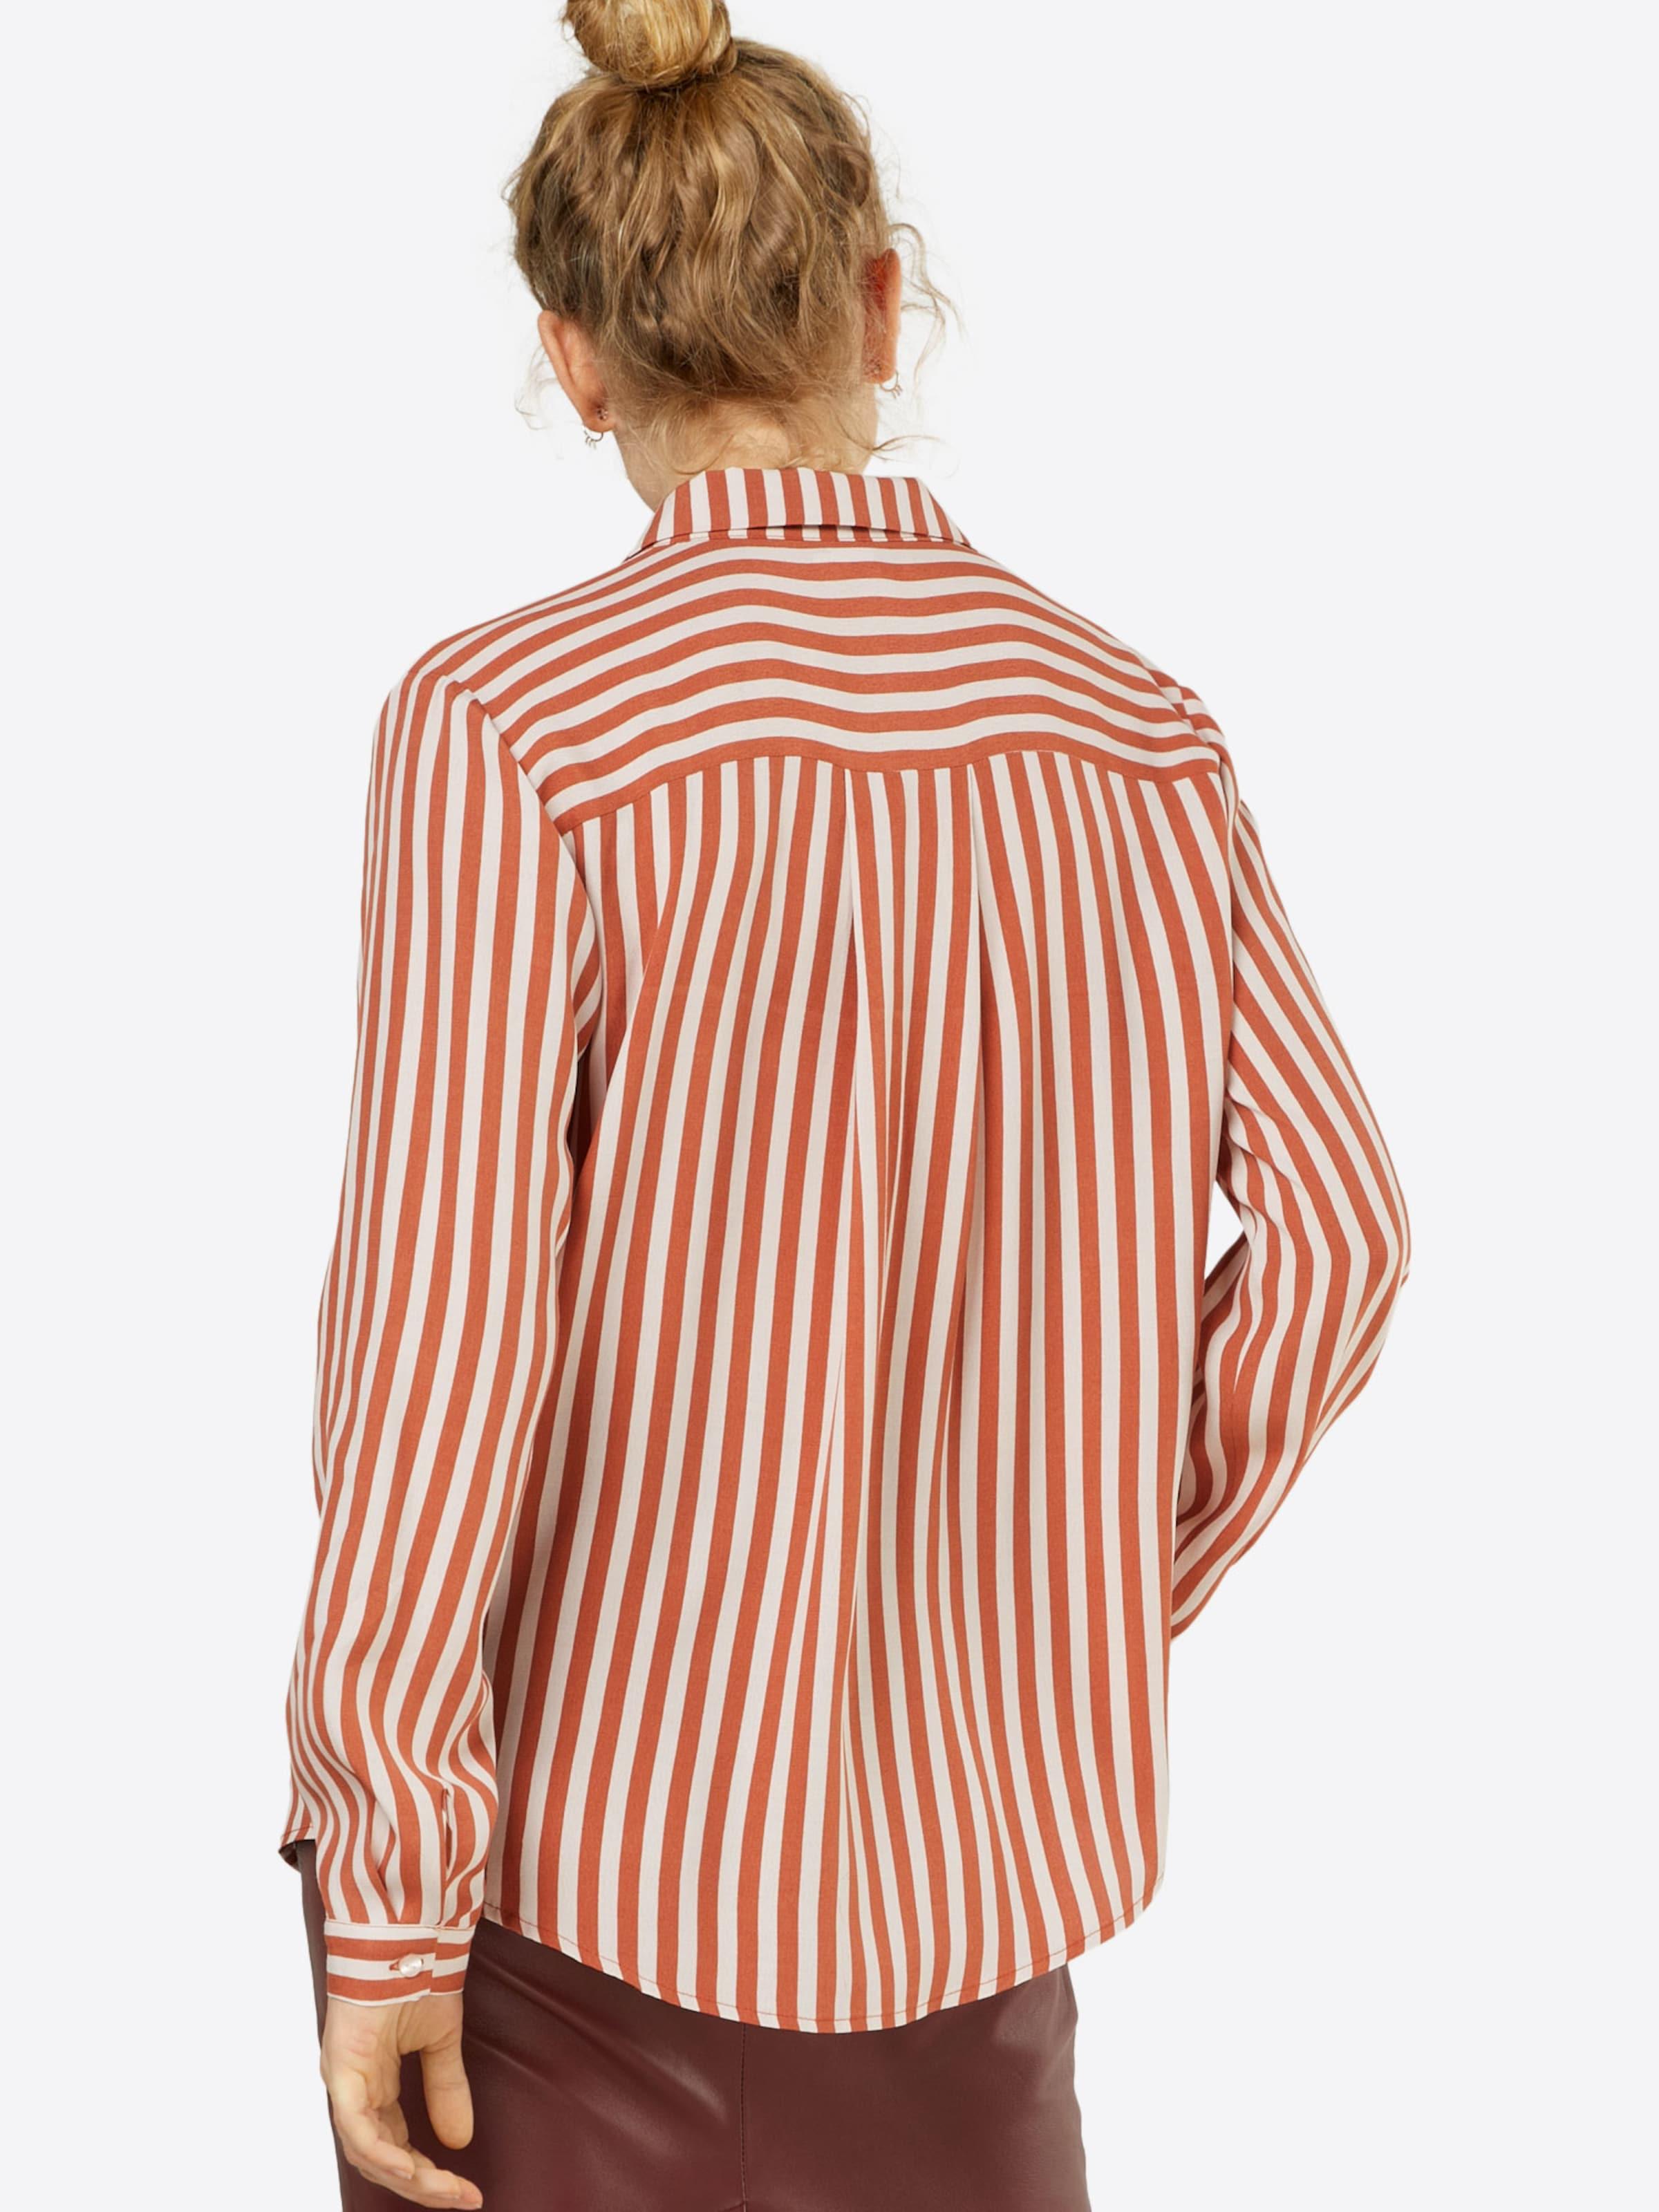 Shirt' En P Rouge 'two Saint RouilleBlanc Stripe Tropez Chemisier Tone bfvY6gy7